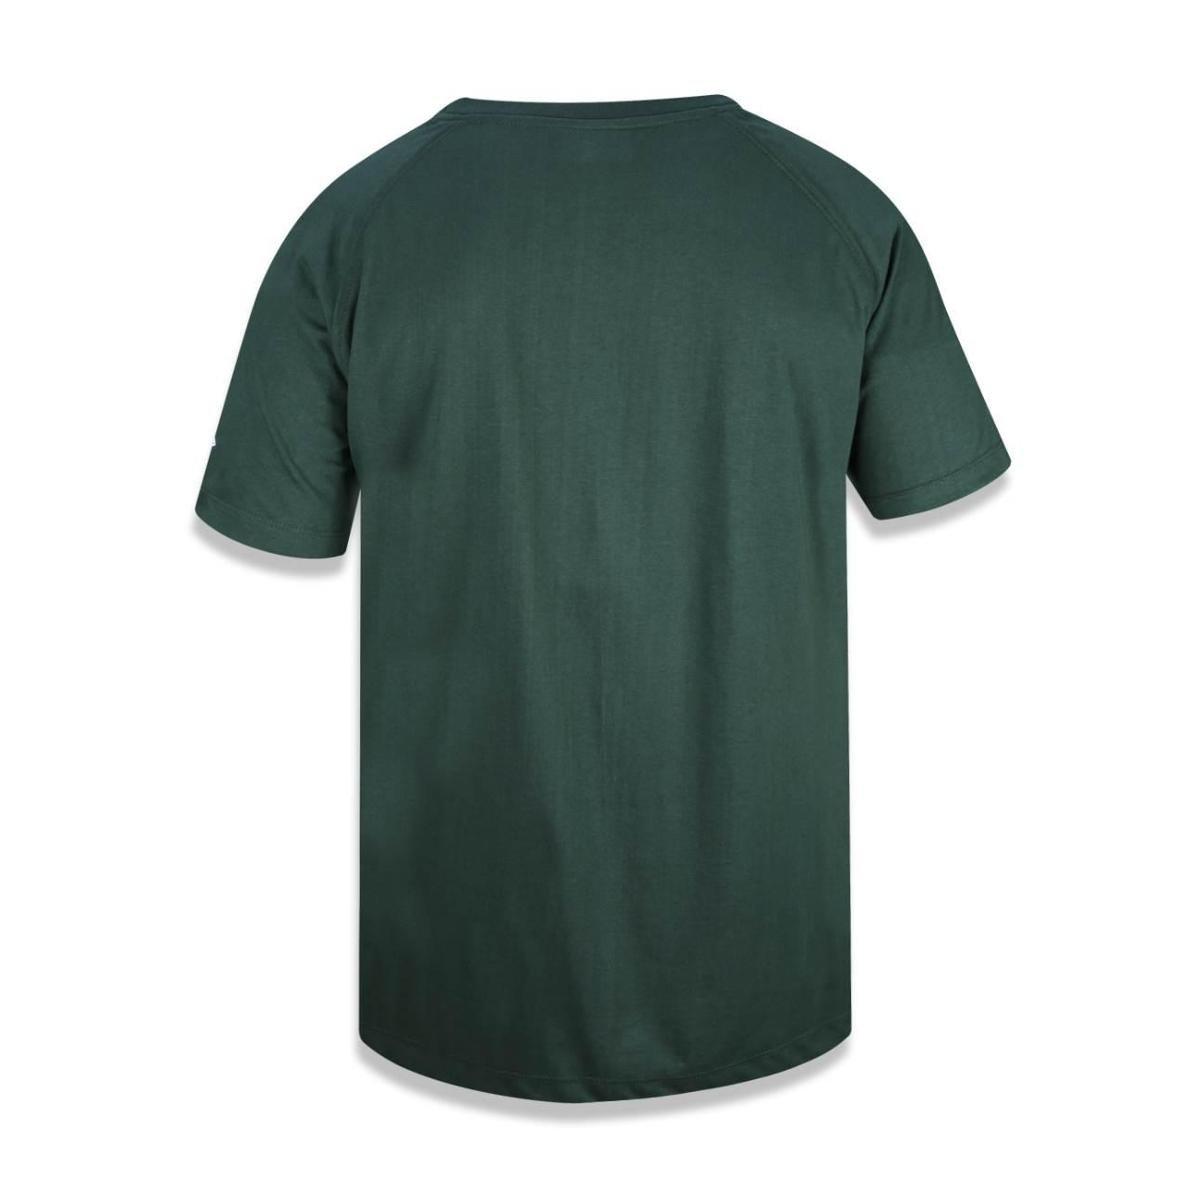 Camiseta Green Bay Packers NFL New Era Masculina - Verde - Compre ... 677e2673f66